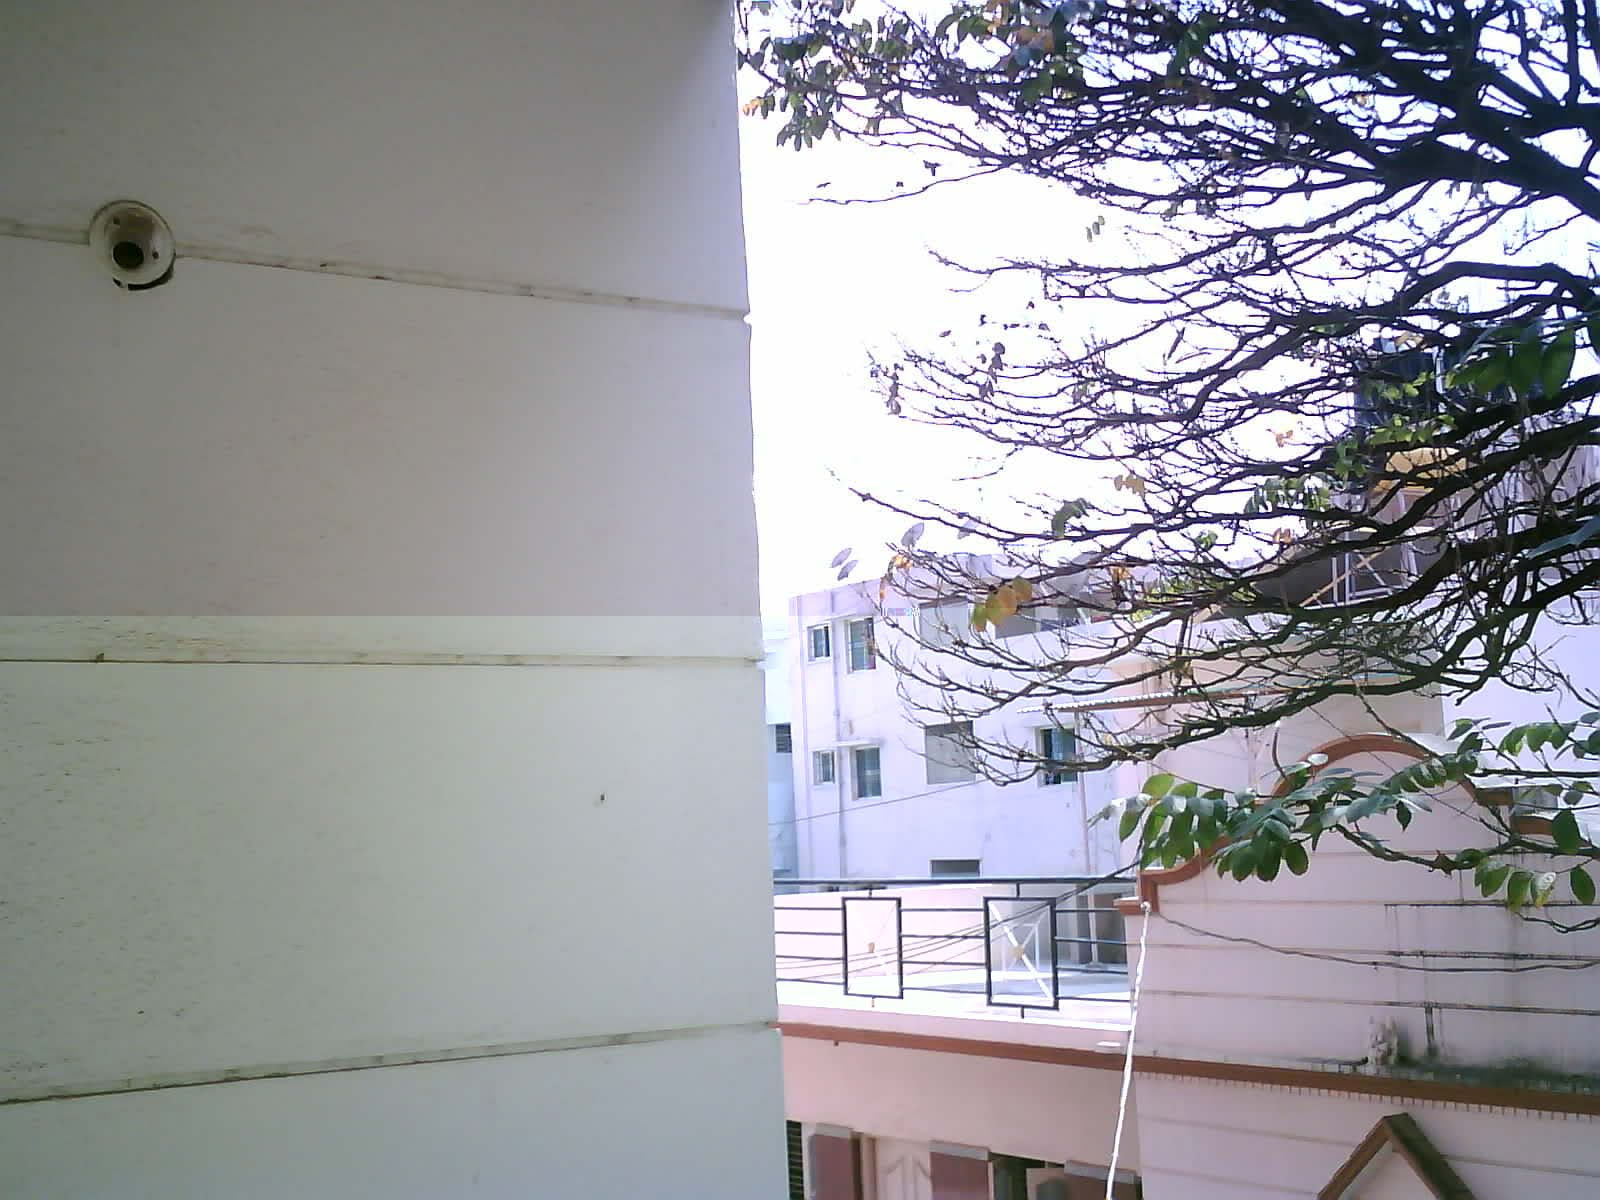 Outdoor Image for White balance adjustment